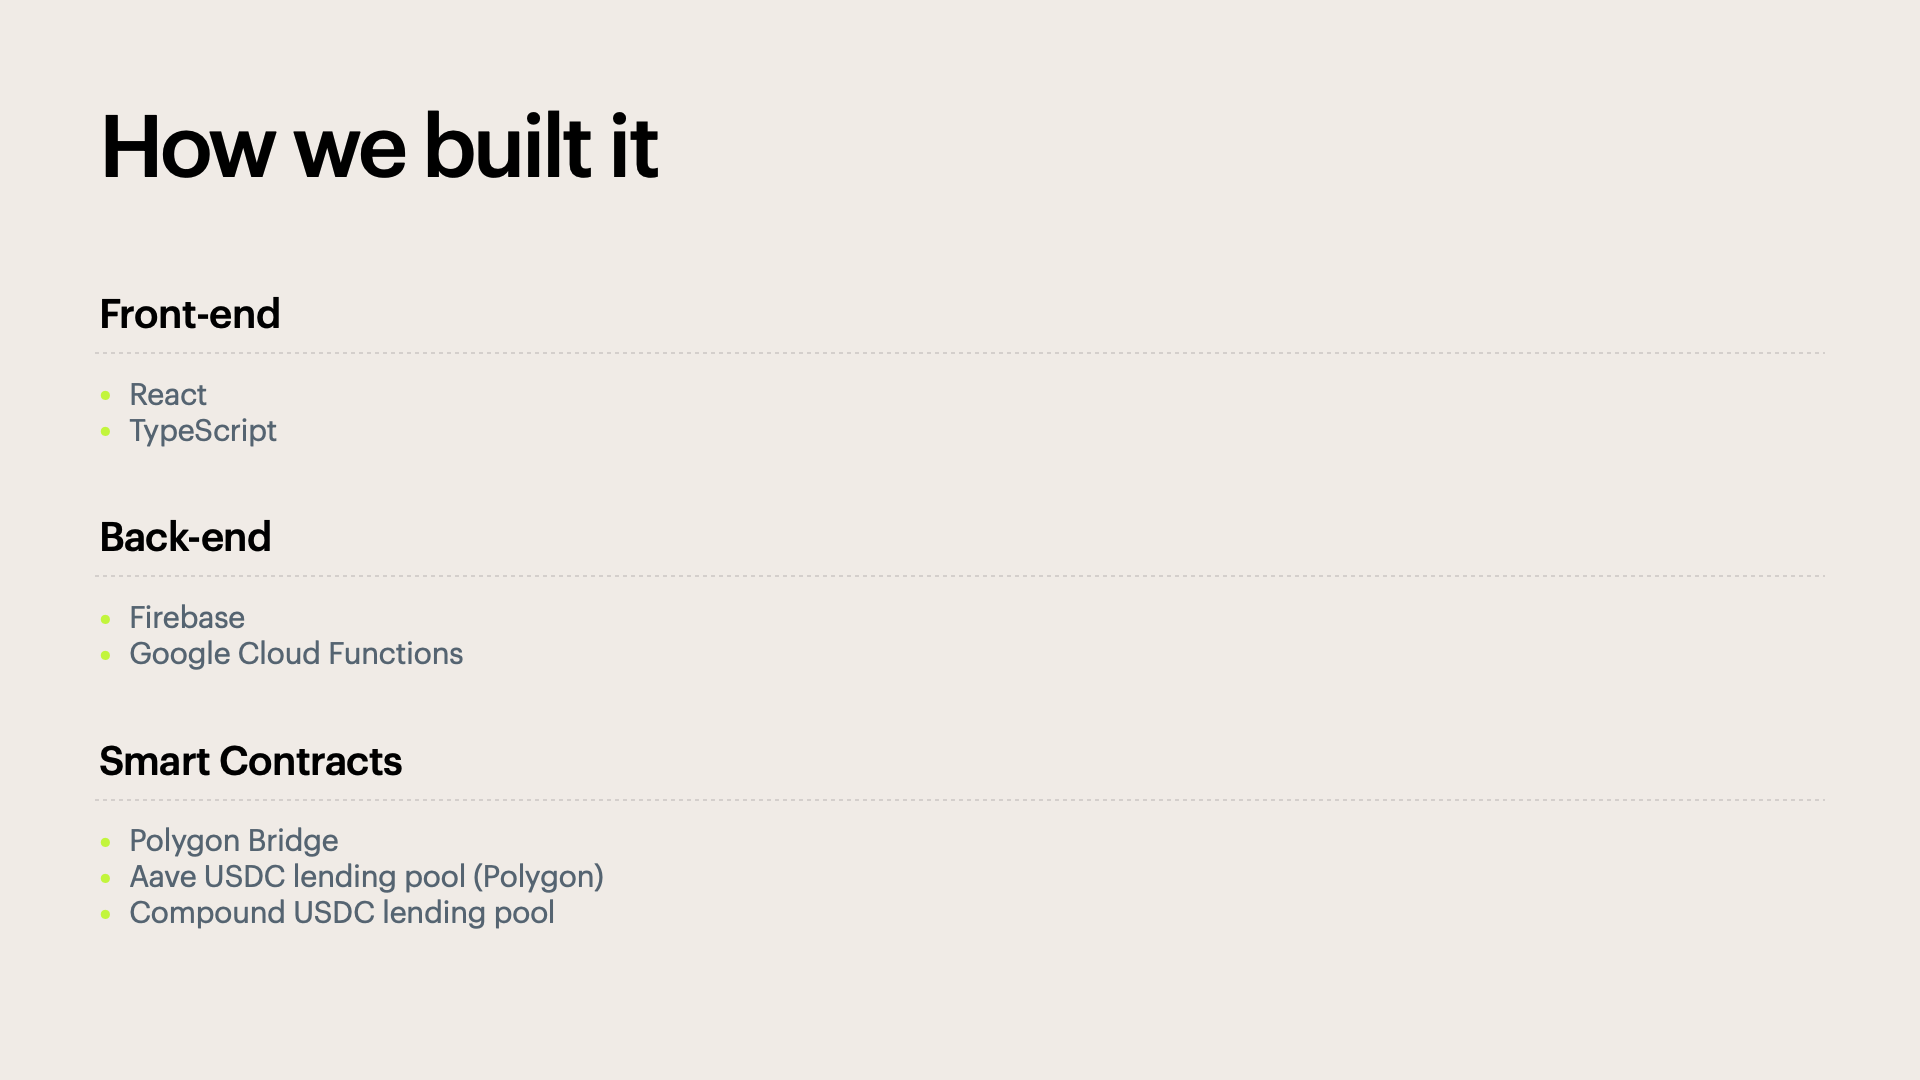 https://ethglobal.s3.amazonaws.com/recO6KZpI9ueA2u5e/how_we_built_it.png